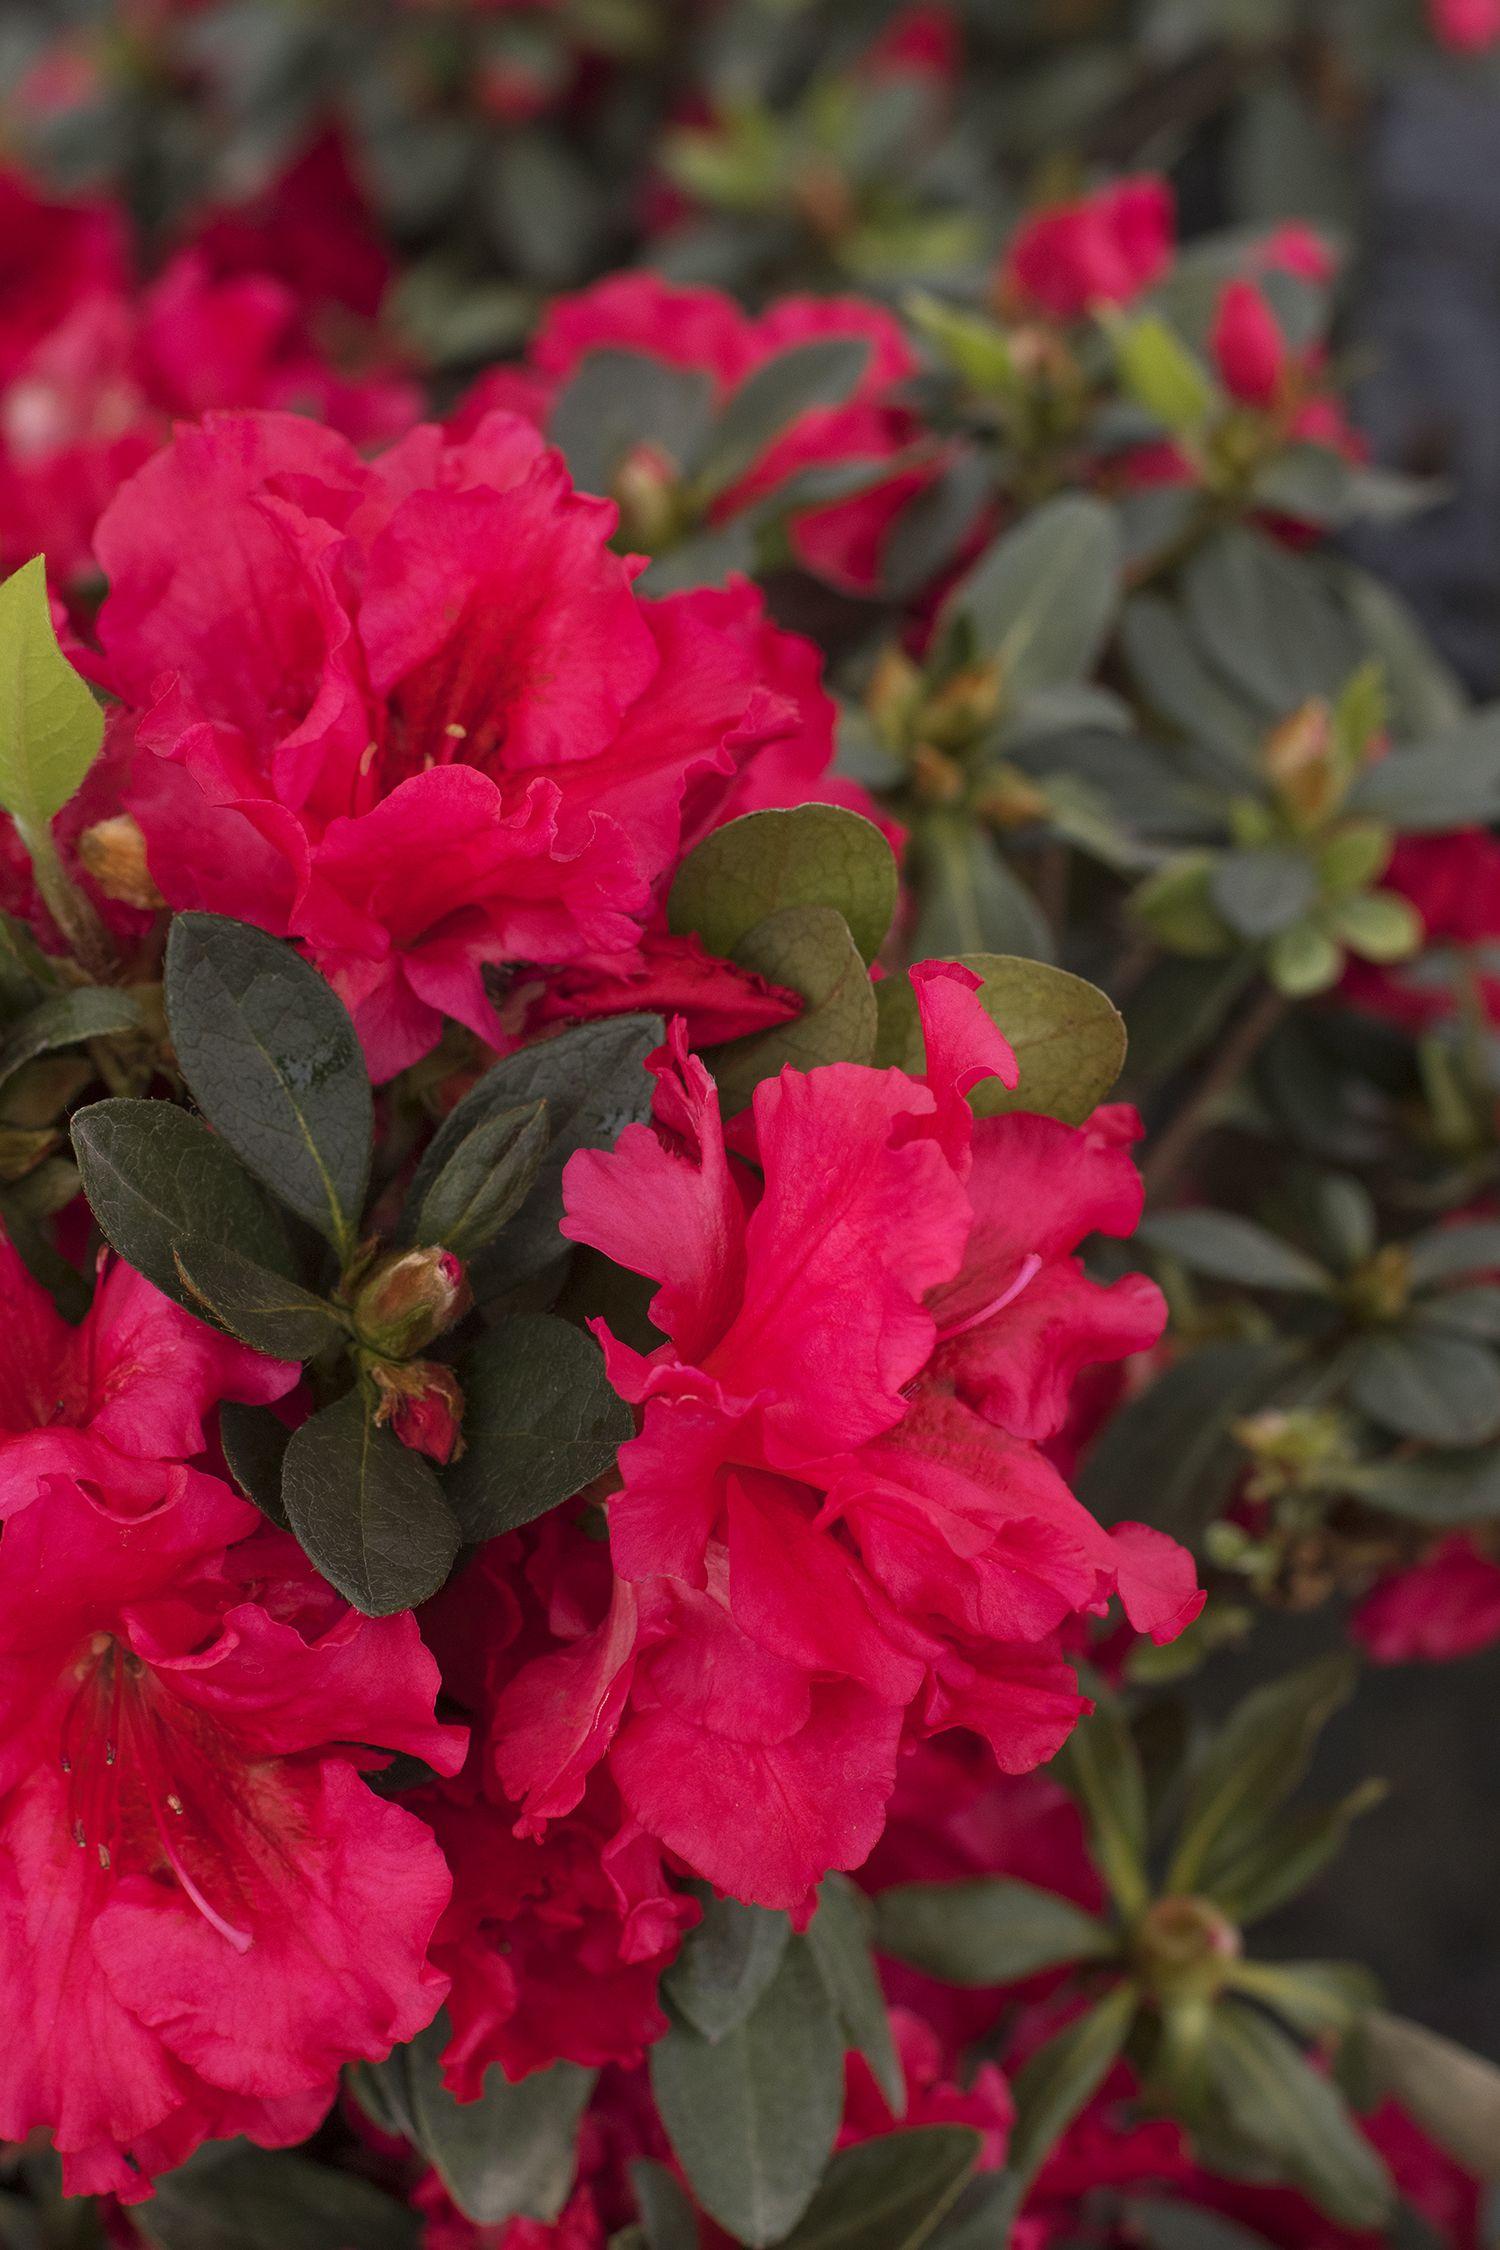 Red Ruffles Azalea Produces Masses Of Showy Deep Cerise Single To Semi Double Blooms With Frilly Petals A Beautiful Evergreen Monrovia Plants Azaleas Plants